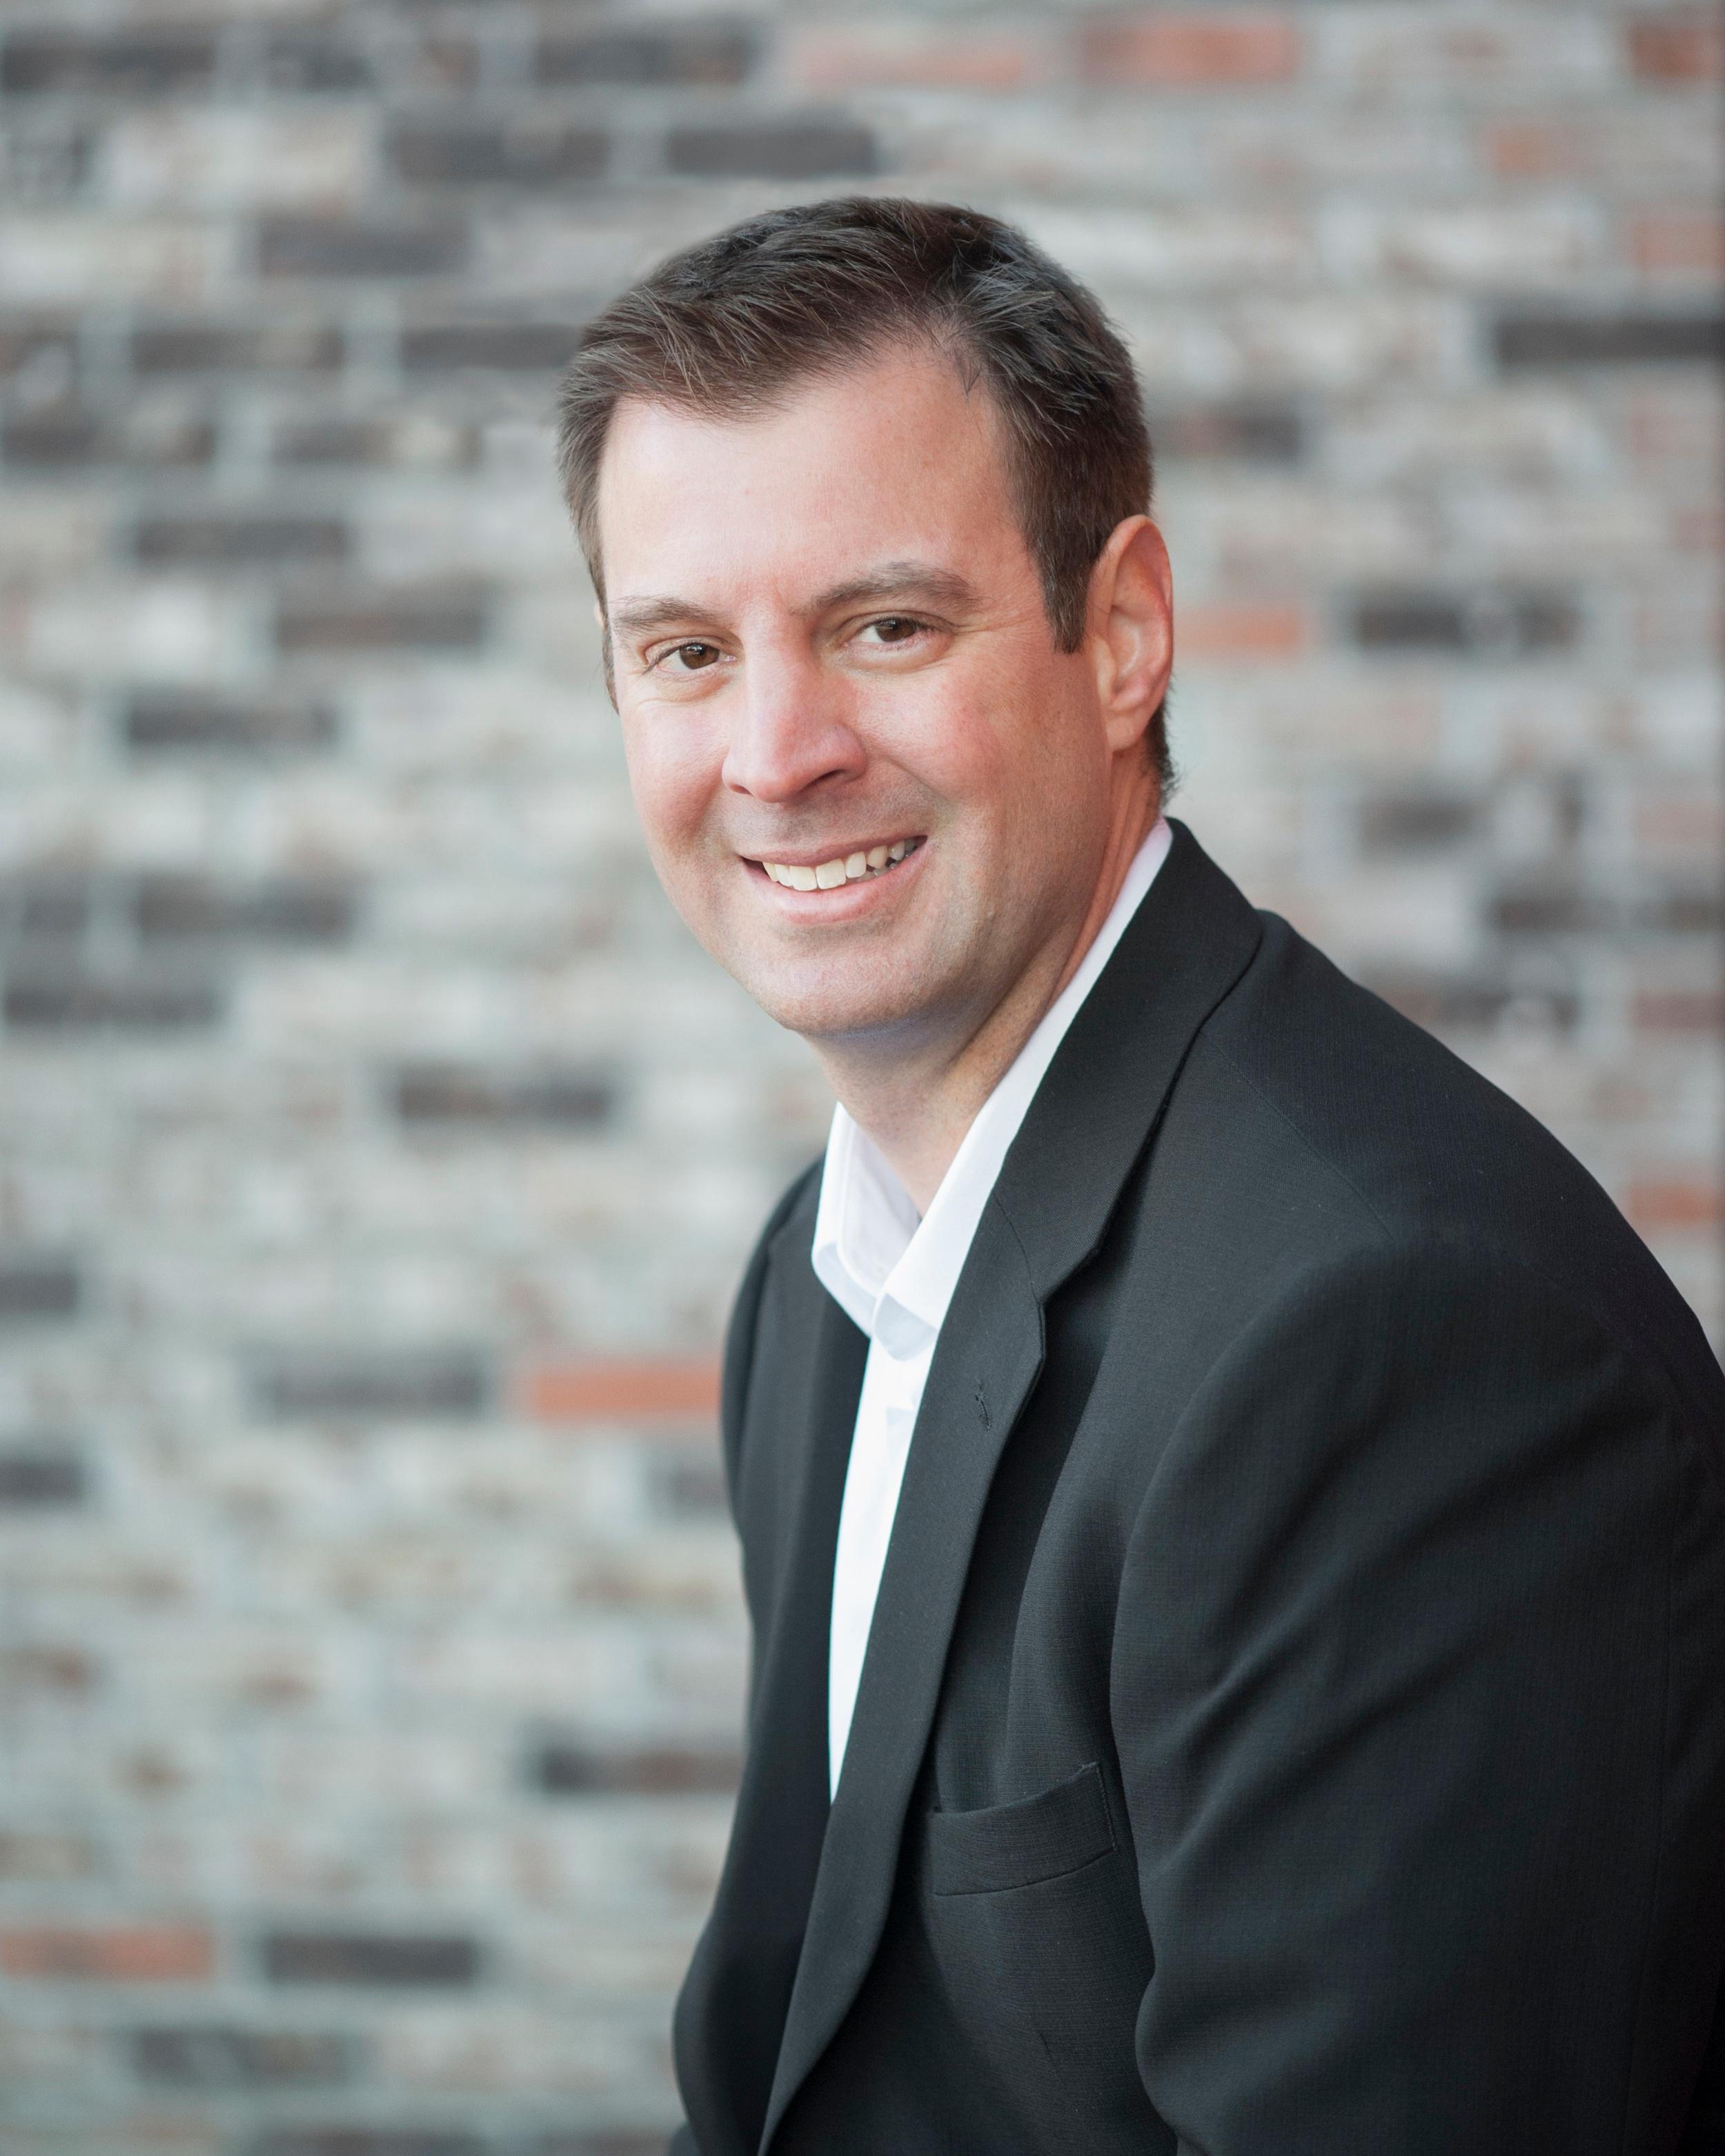 Stephen Grimes